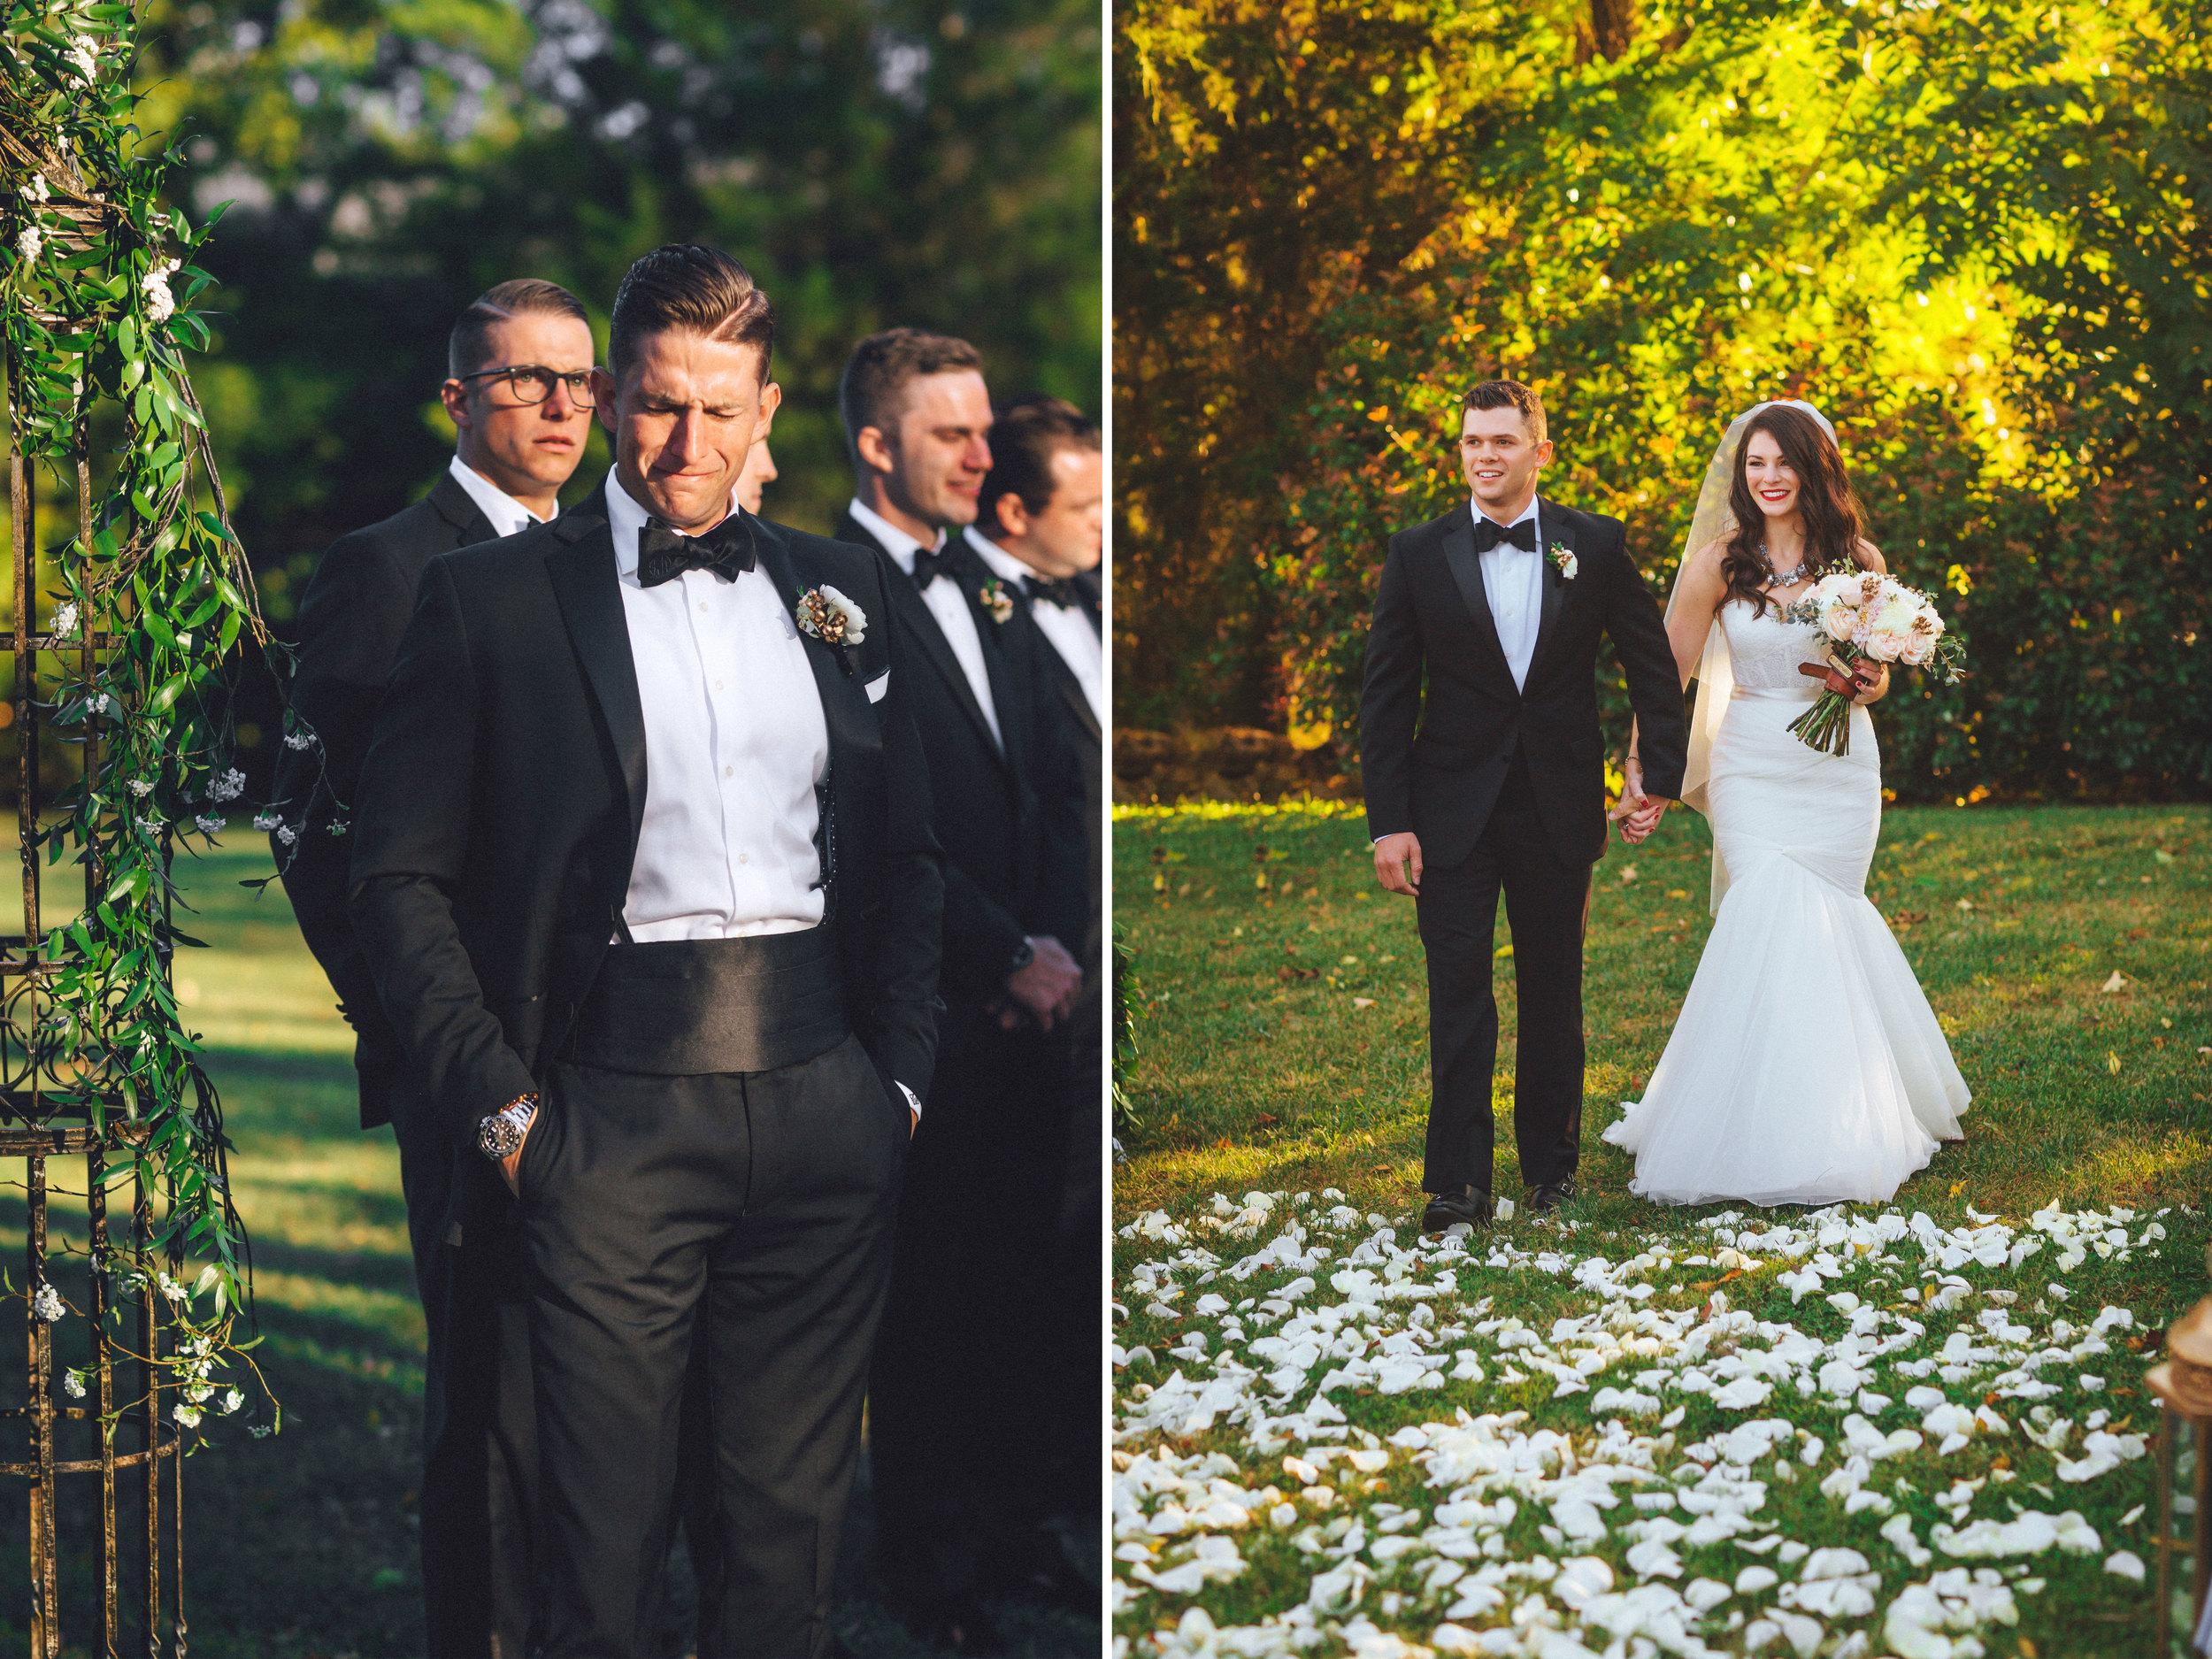 Me & Mr. Jones Wedding, Outdoor Wedding Ceremony, Rose Petals on Aisle, White Rose Petal Aisle